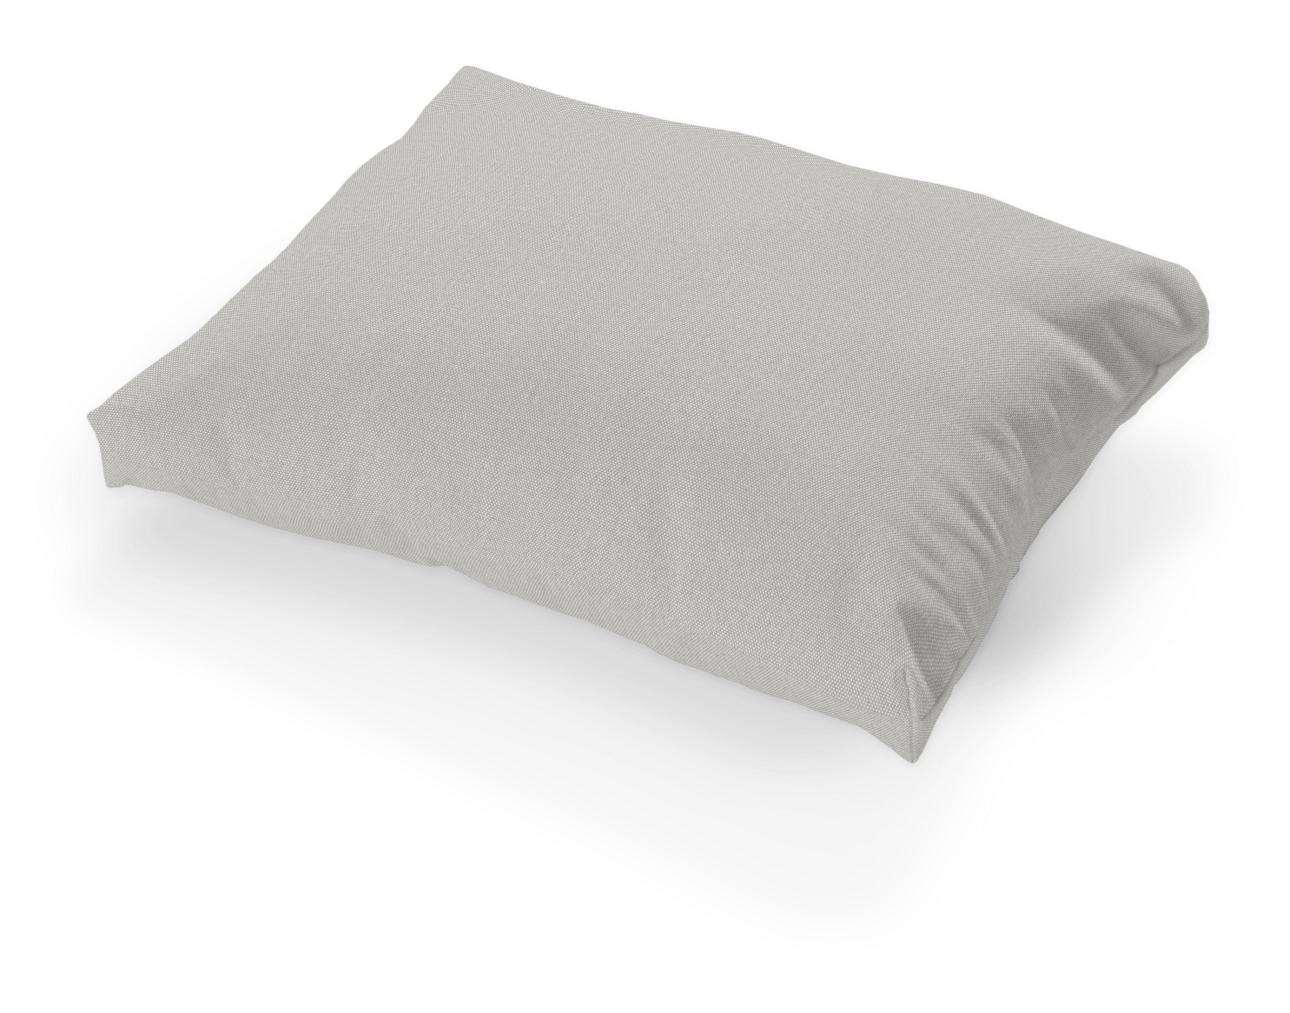 Tylösand pagalvėlės užvalkalas Tylösand pagalvėlė kolekcijoje Etna , audinys: 705-90